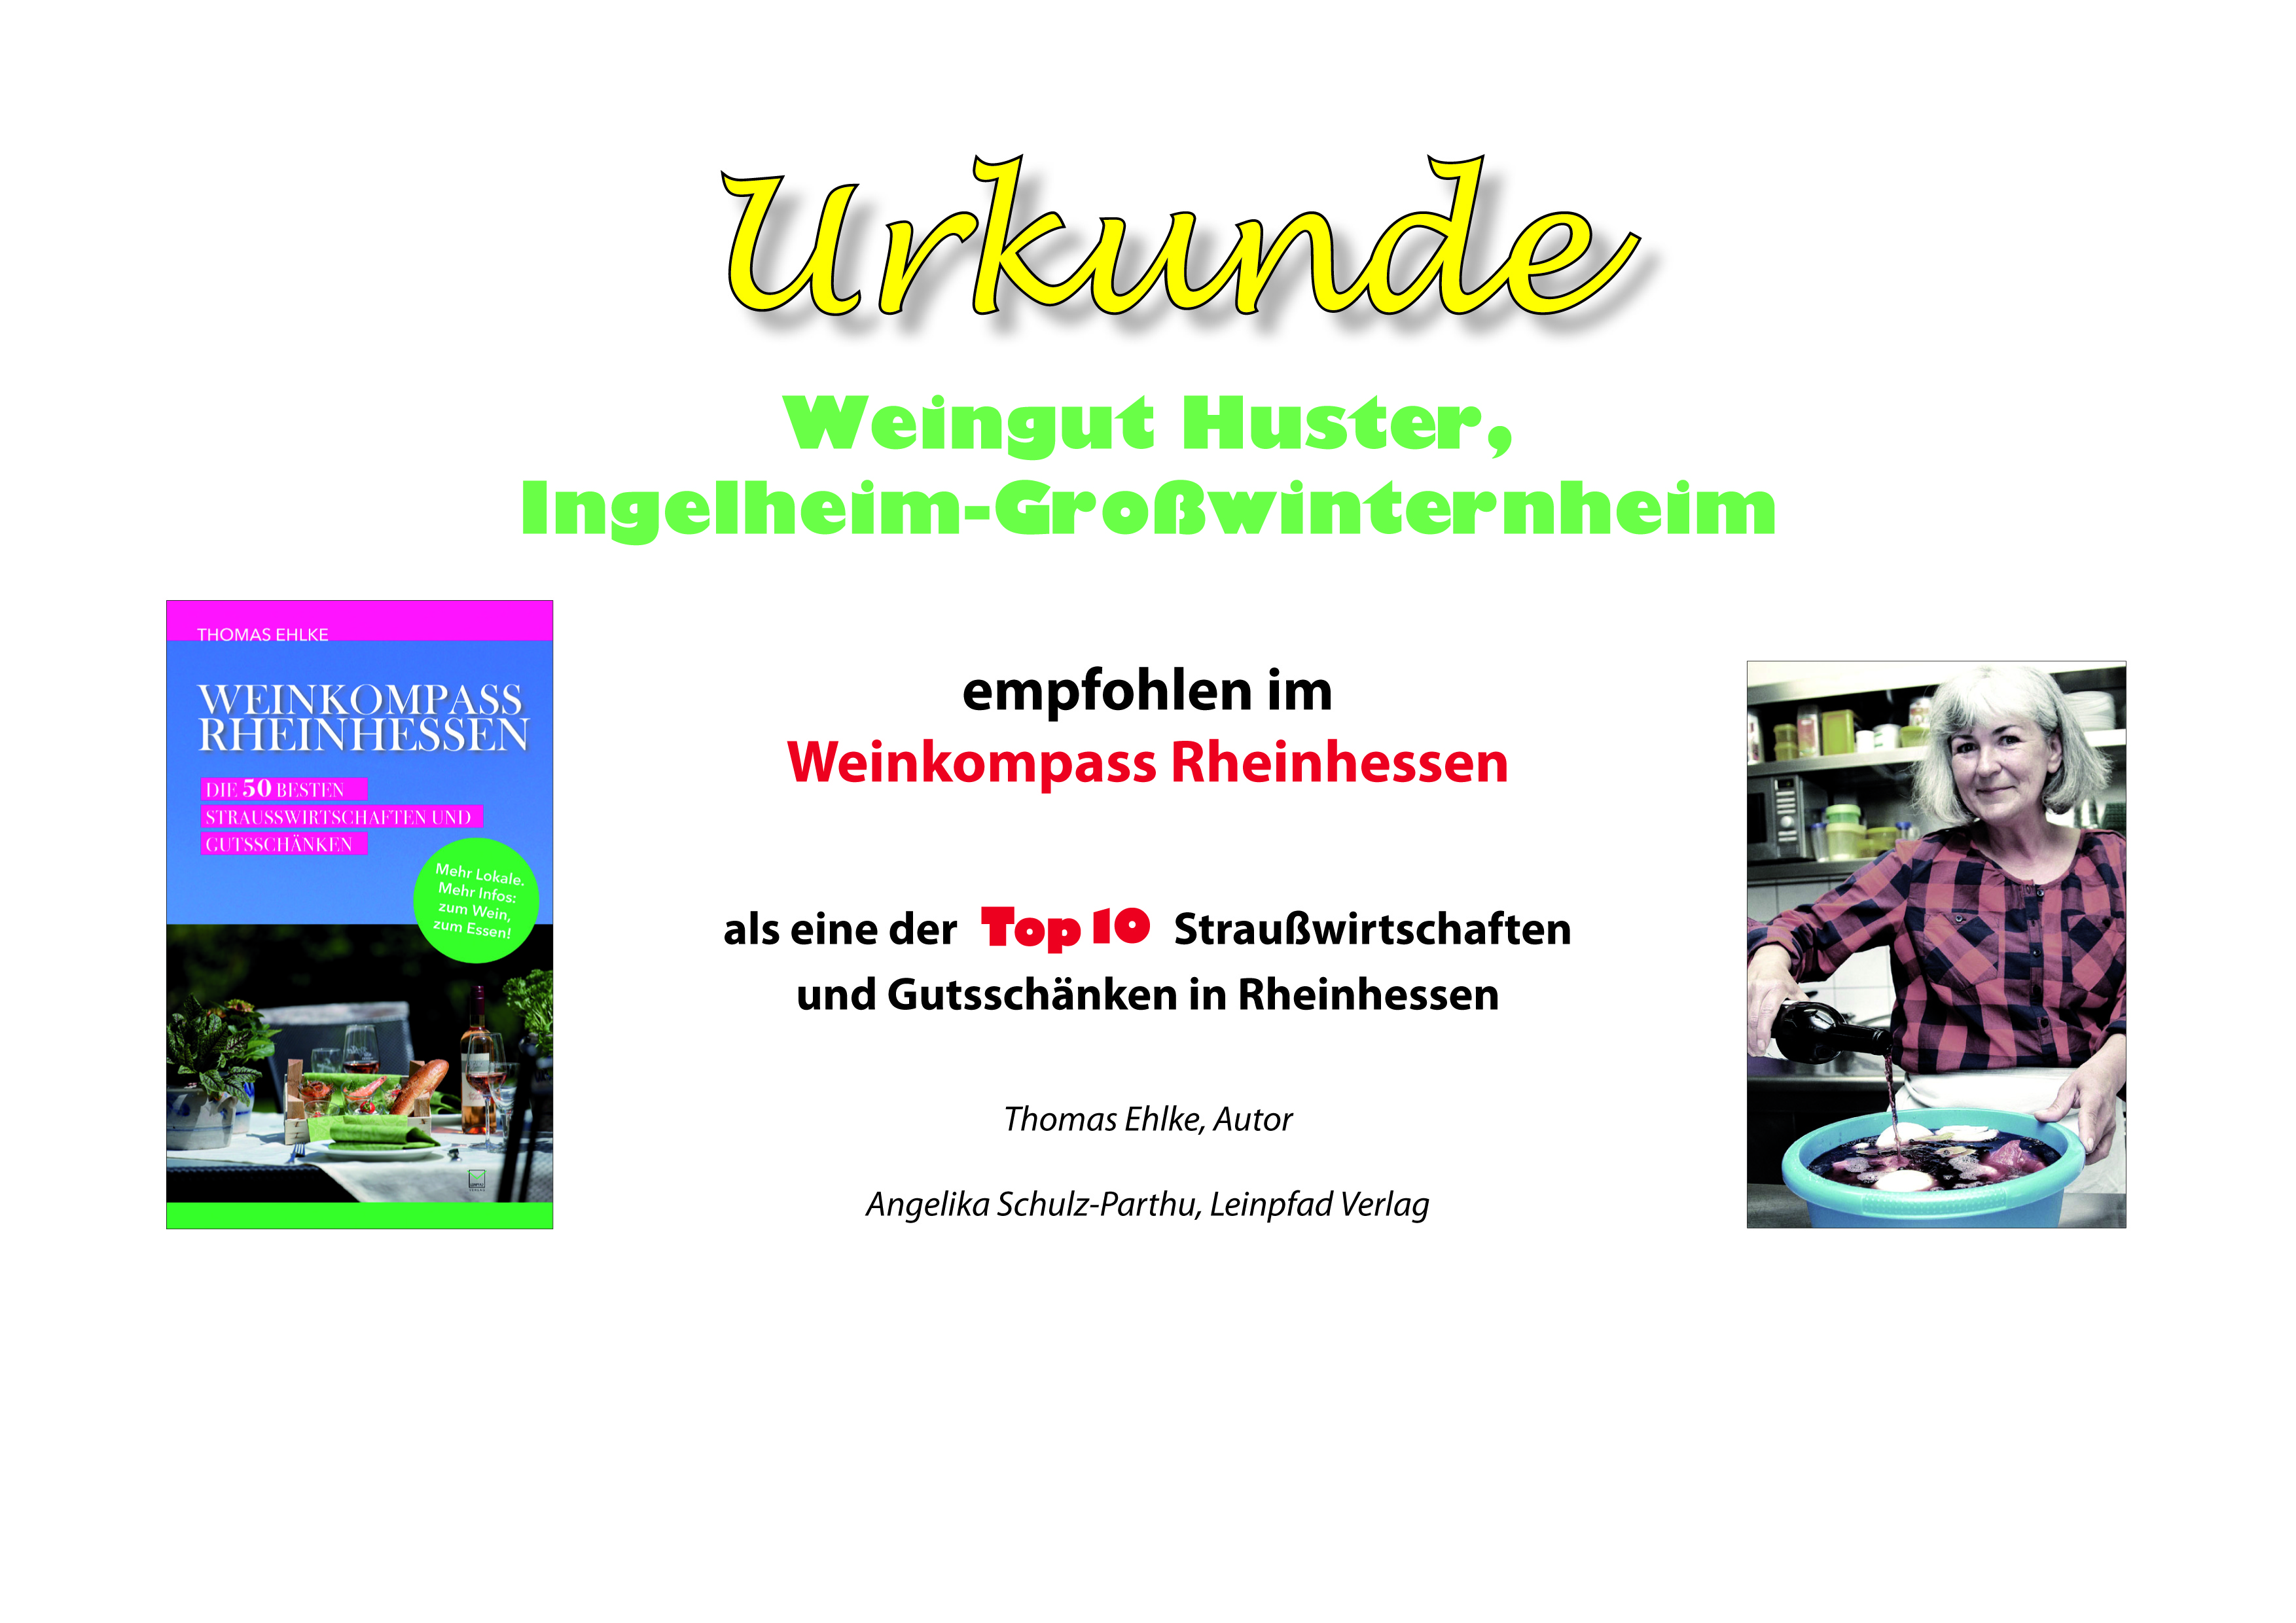 Ingelheim-Großwinternheim_Huster